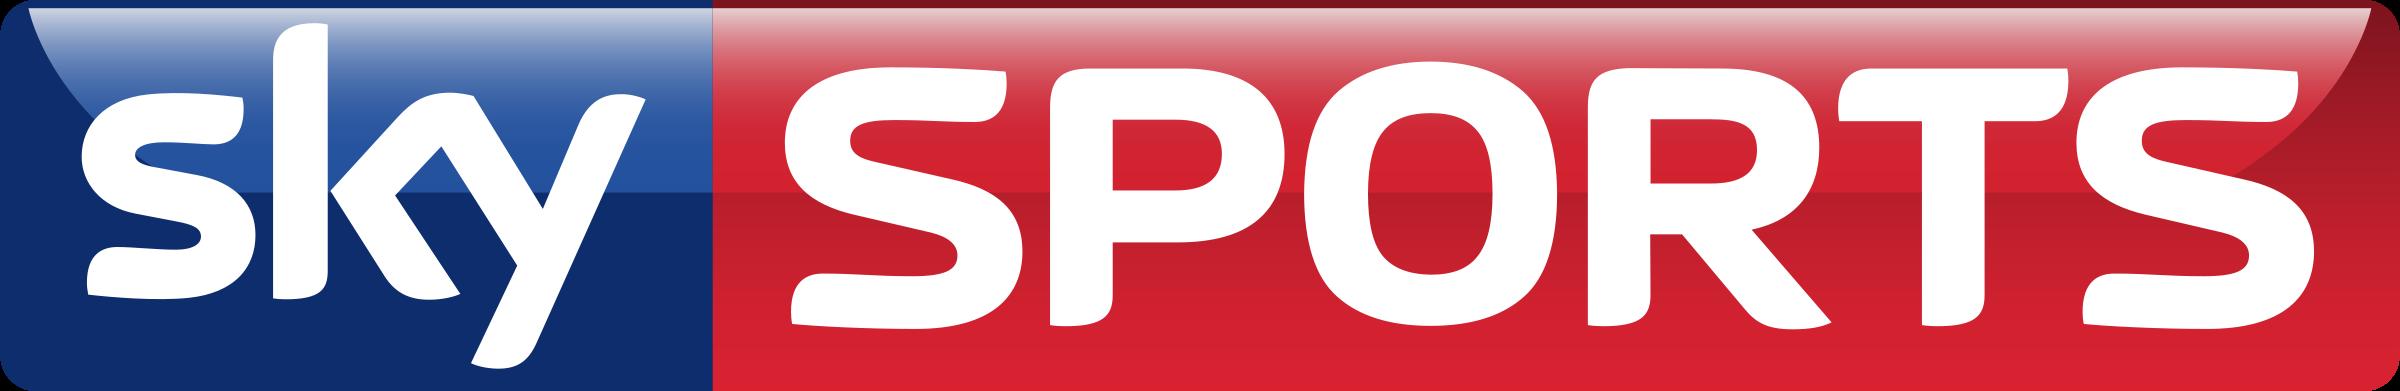 Sky Sports Logo PNG Transparent & SVG Vector.